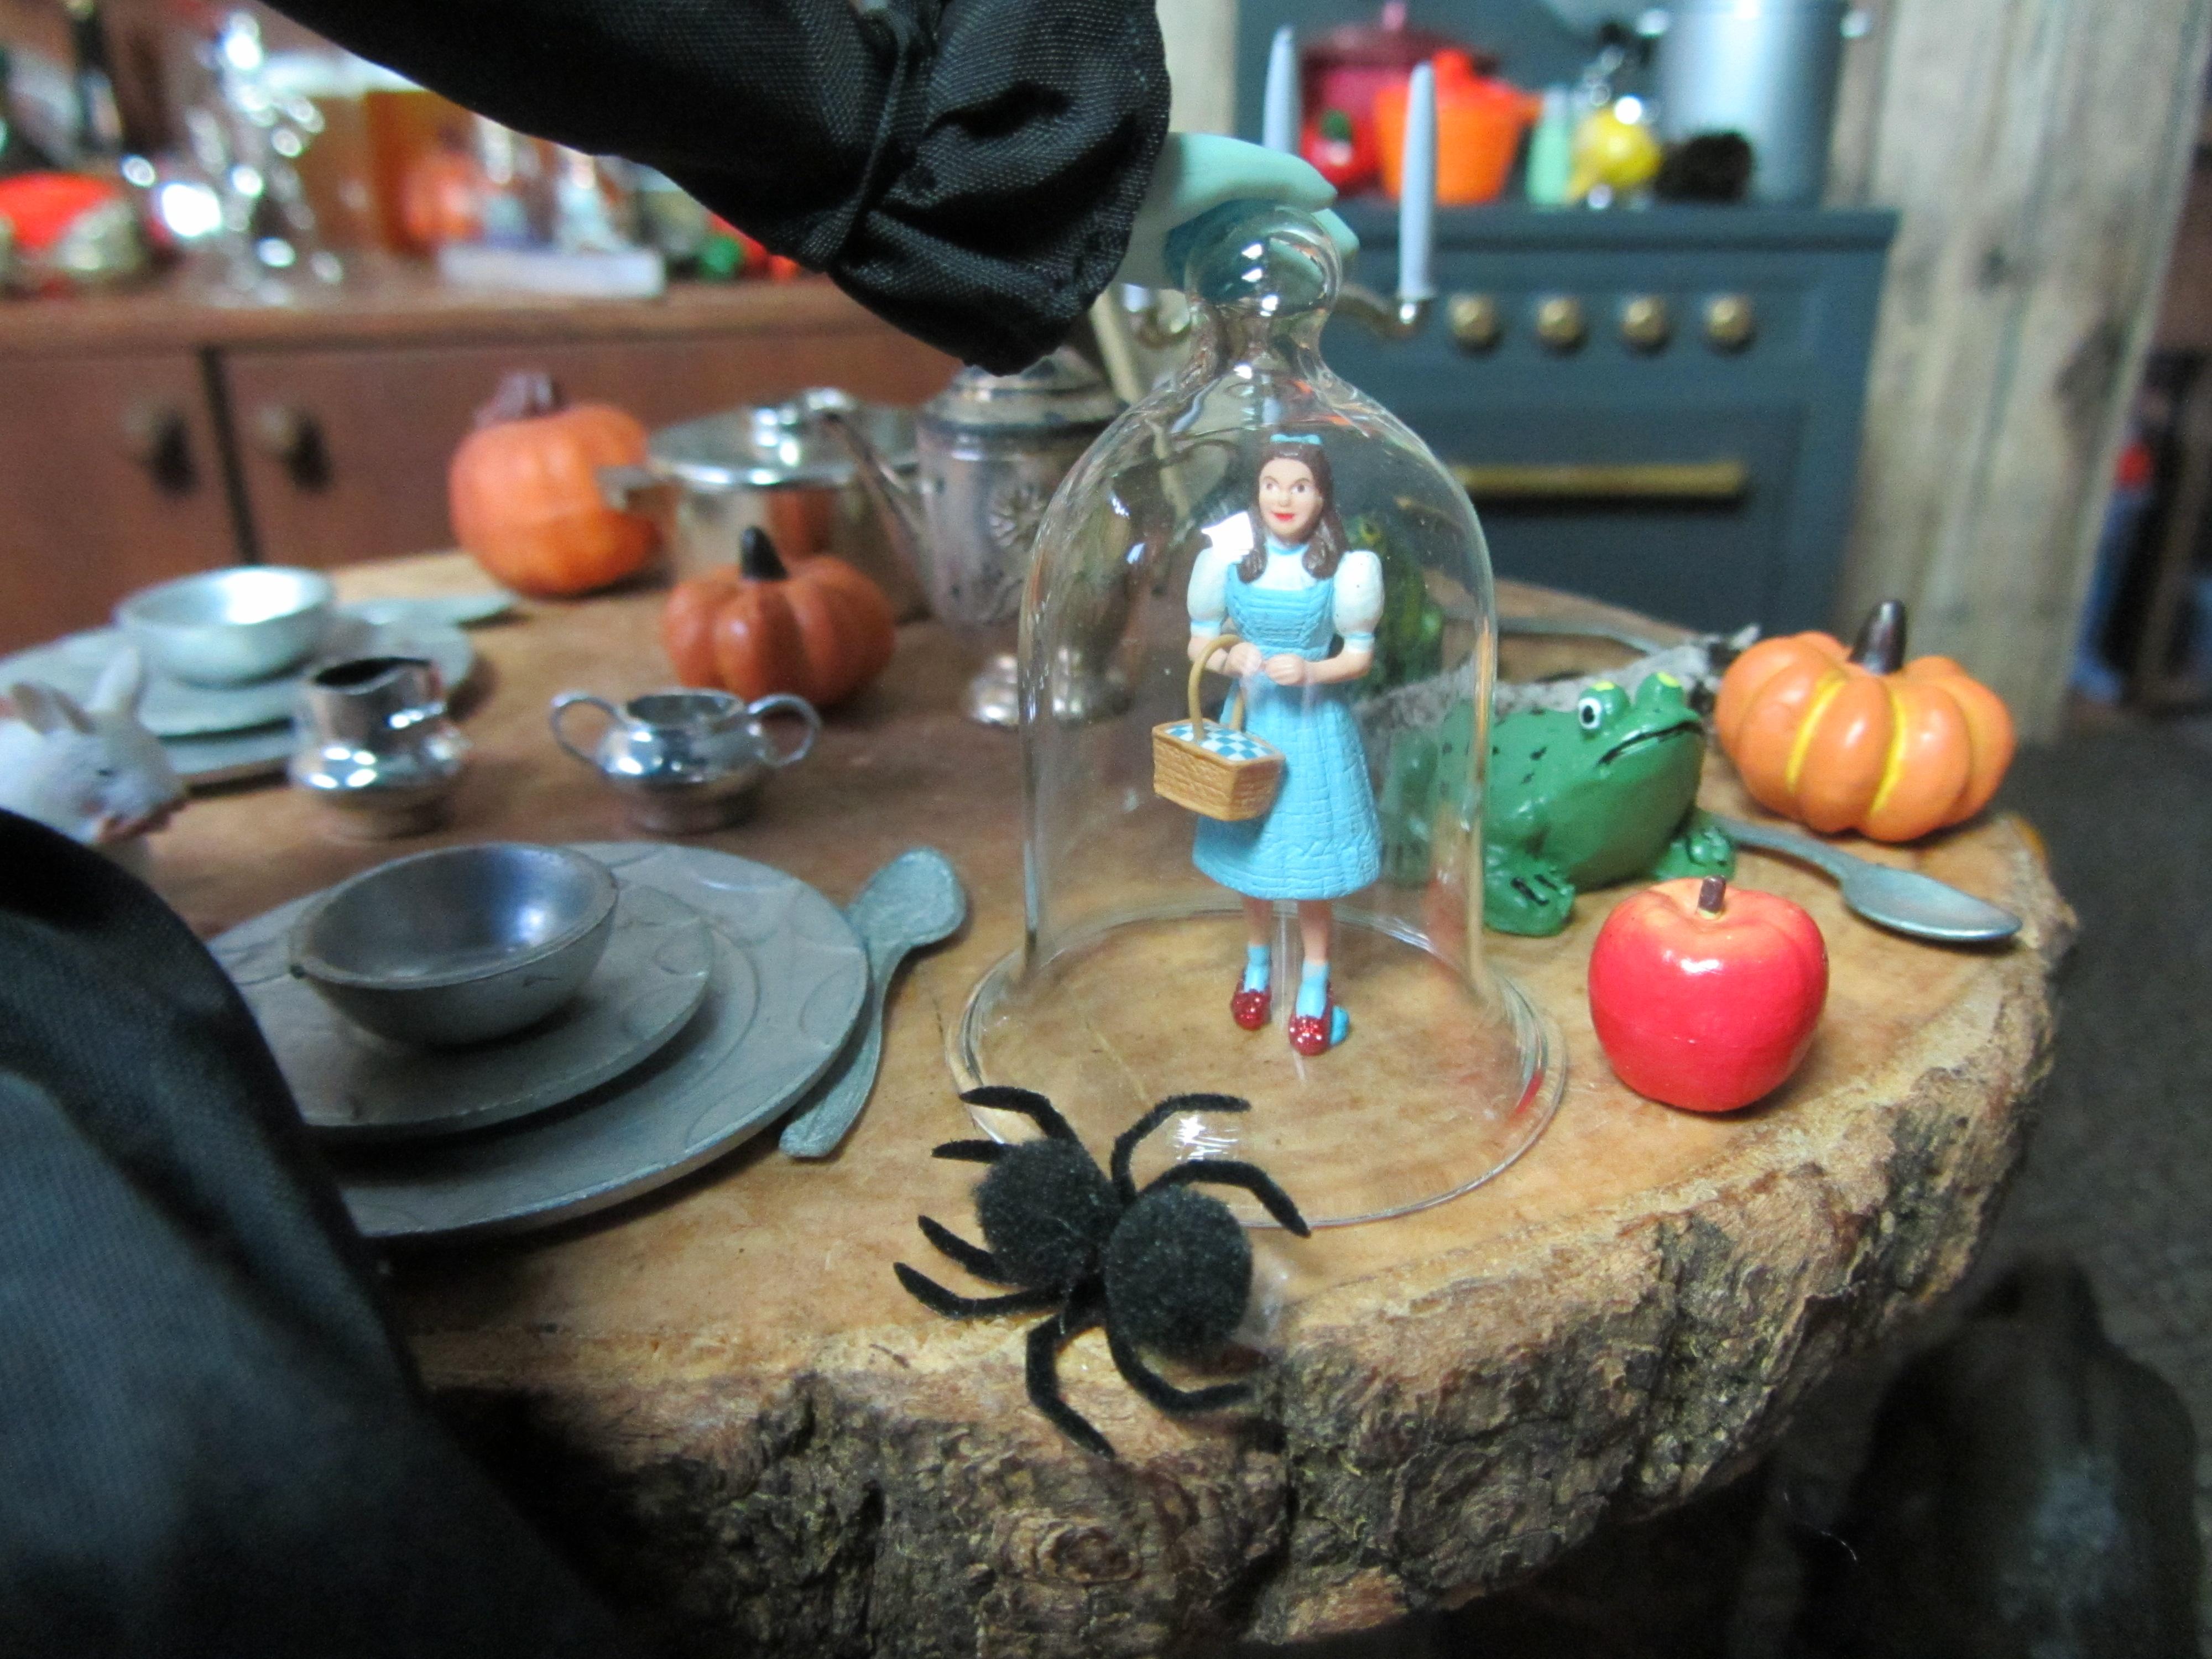 Hintergrundbilder : Rahmen, Küche, Jahrgang, Dorothy, Miniatur ...